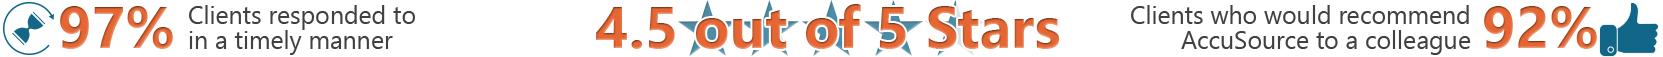 oct-2019-client-satisfaction-survey-banner